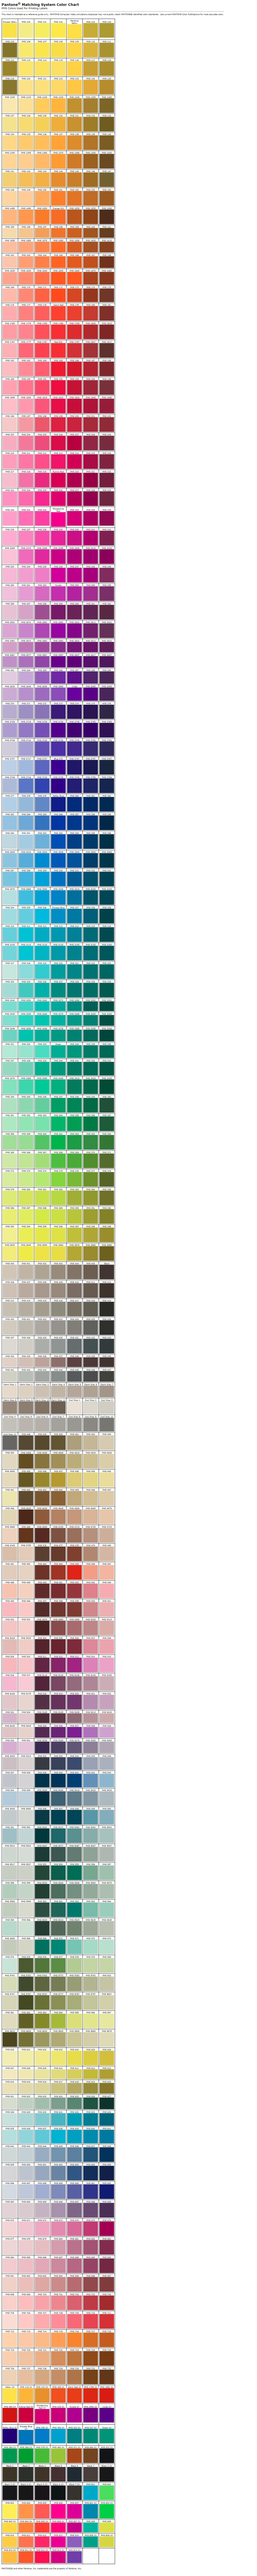 PMS Pantone® Color Chart | Red Lodge Label